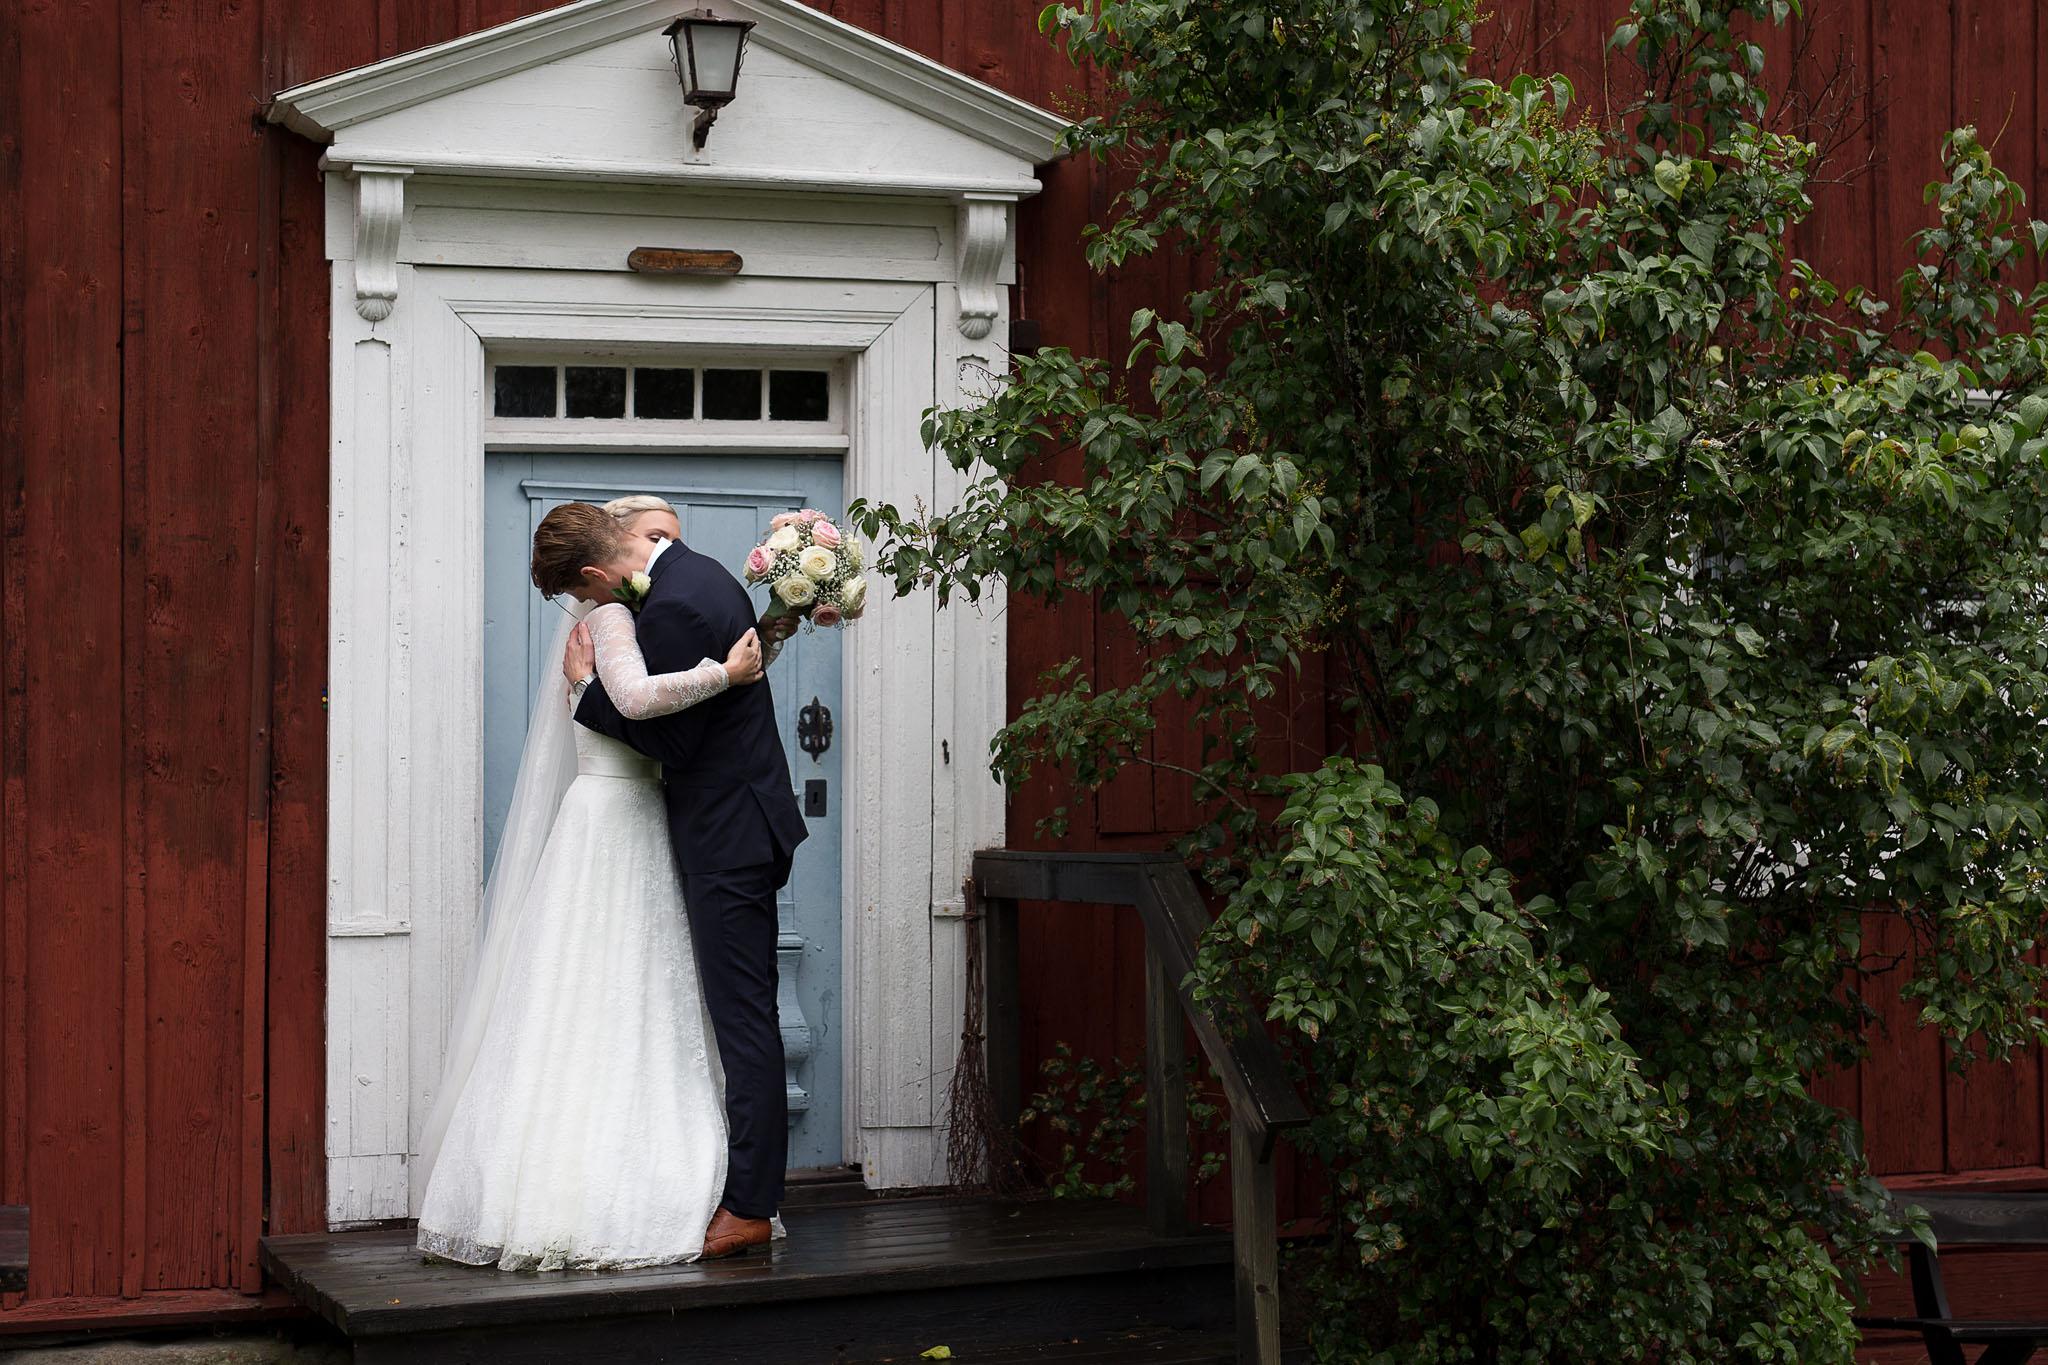 fotograf sabina wixner hudiksvall bröllop 35.jpg